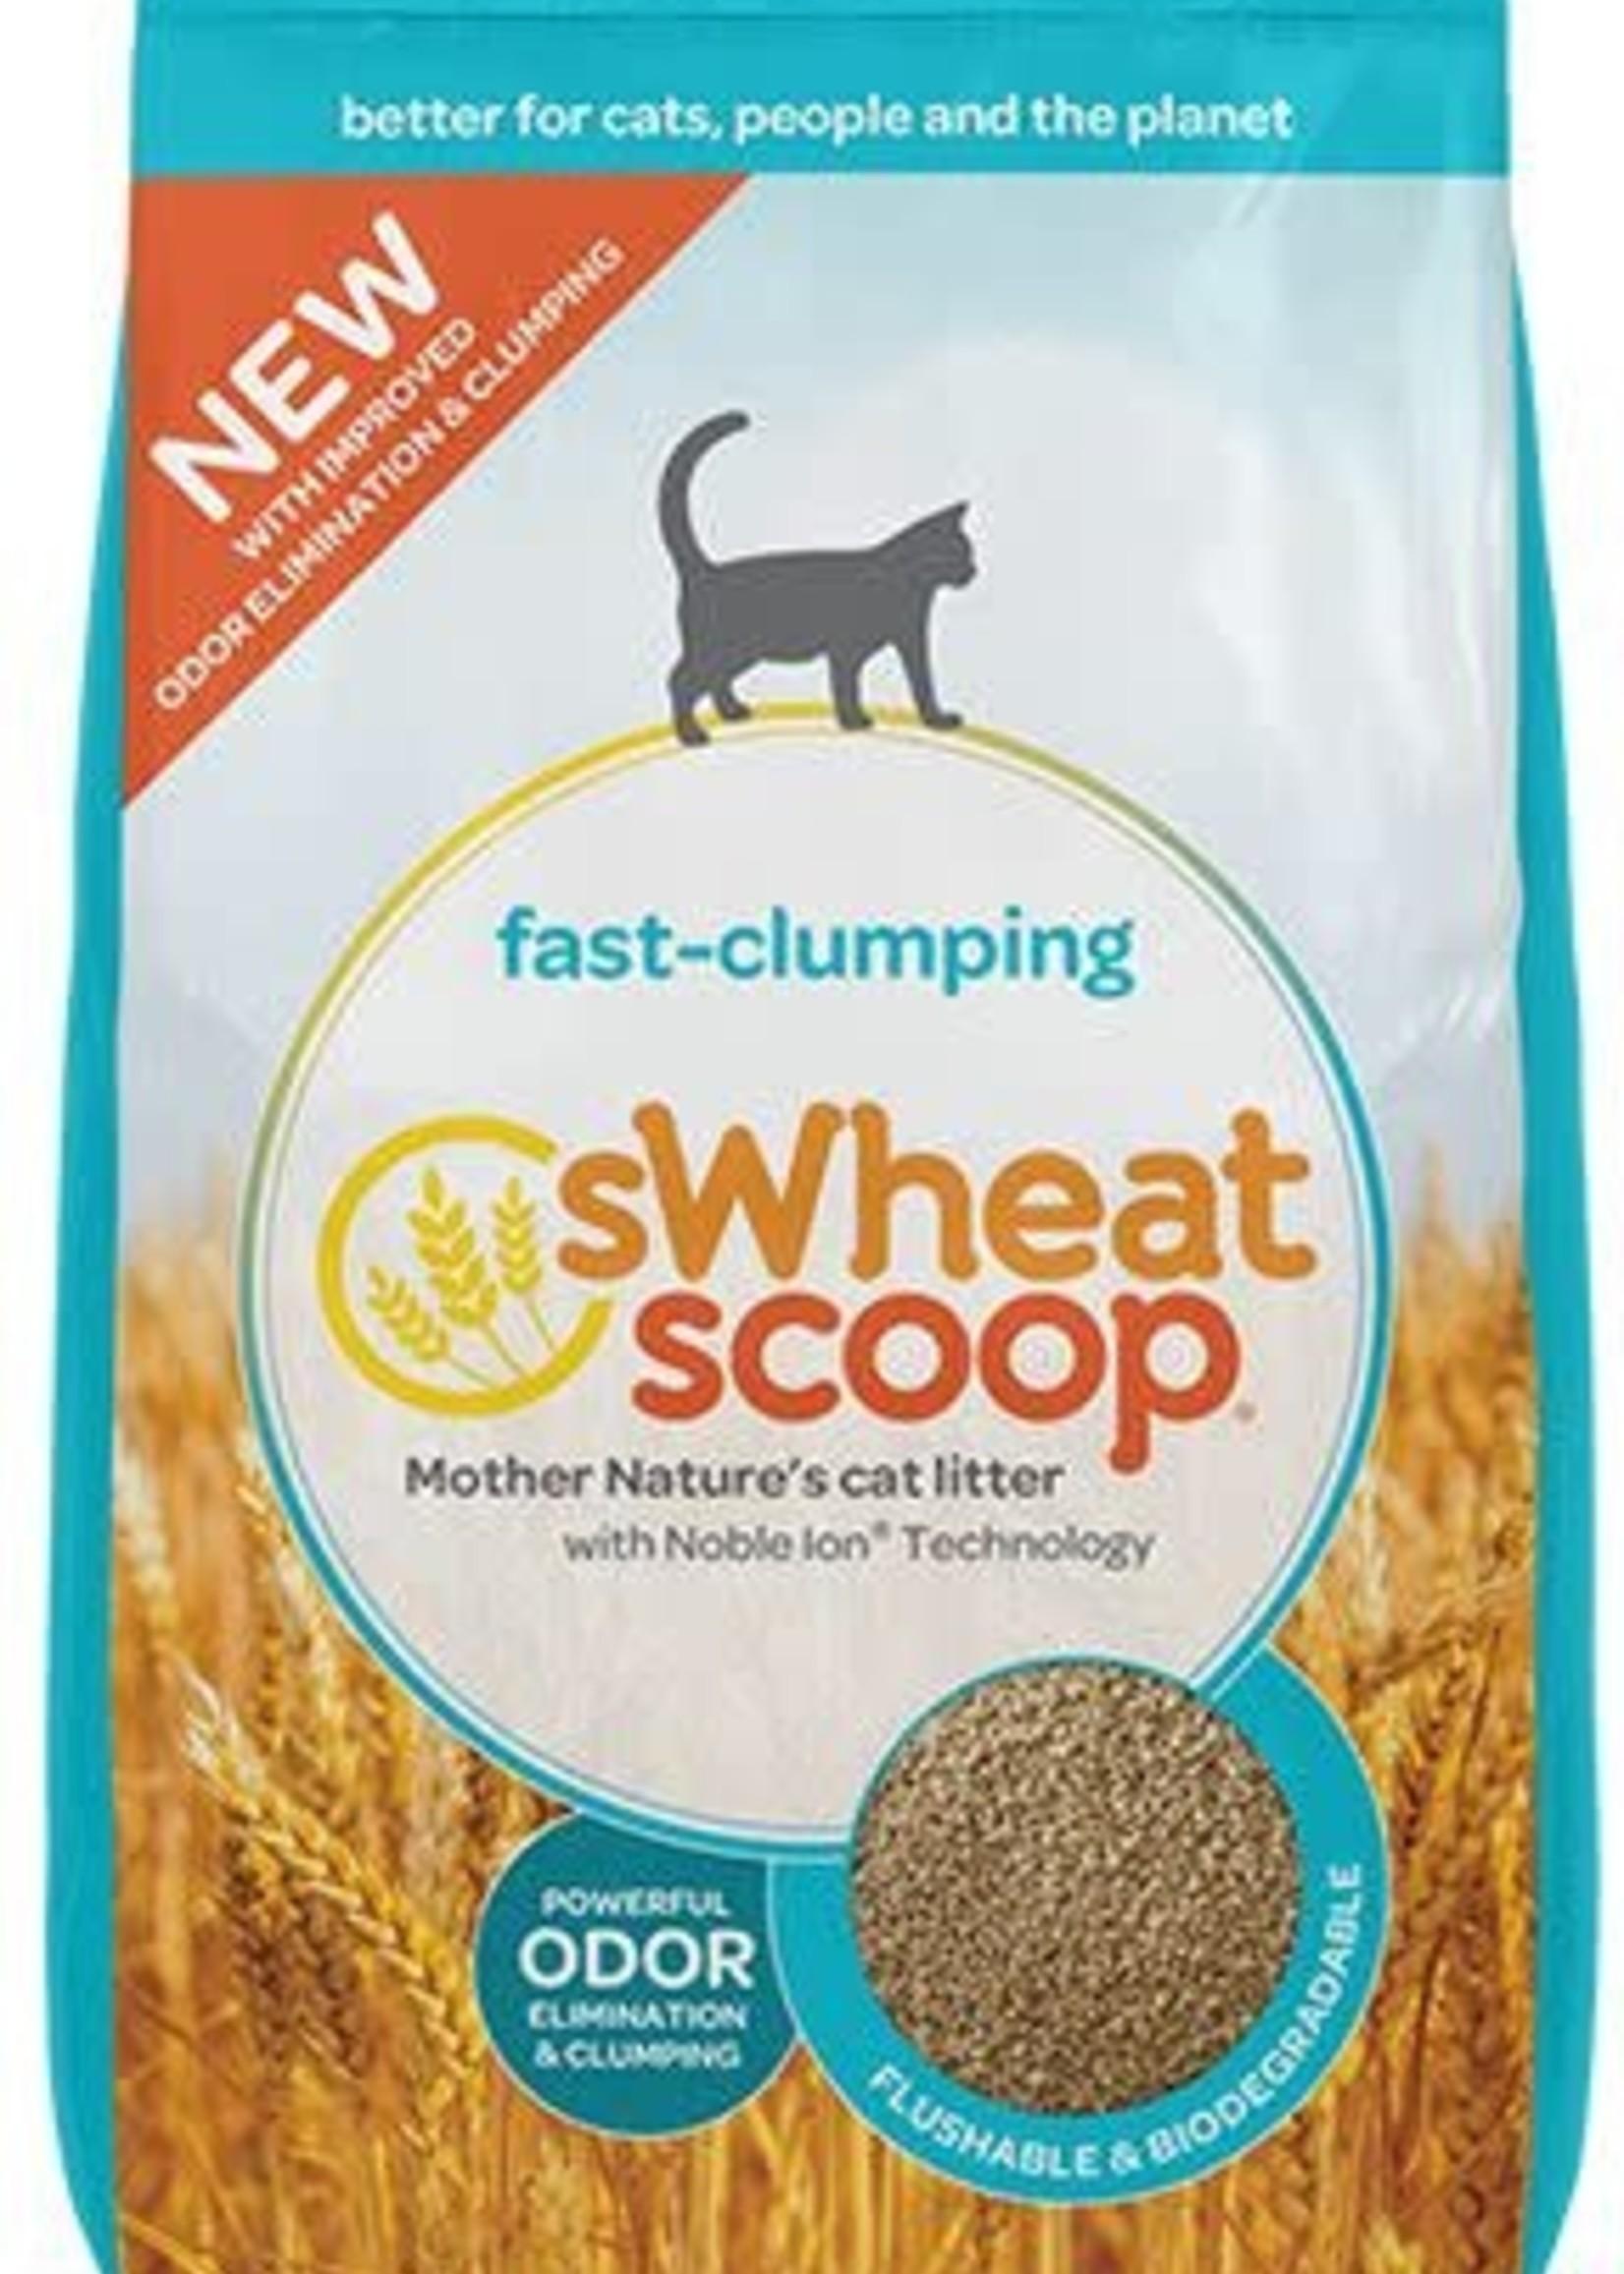 sWheat scoop Swheat Scoop Cat Litter 36lb